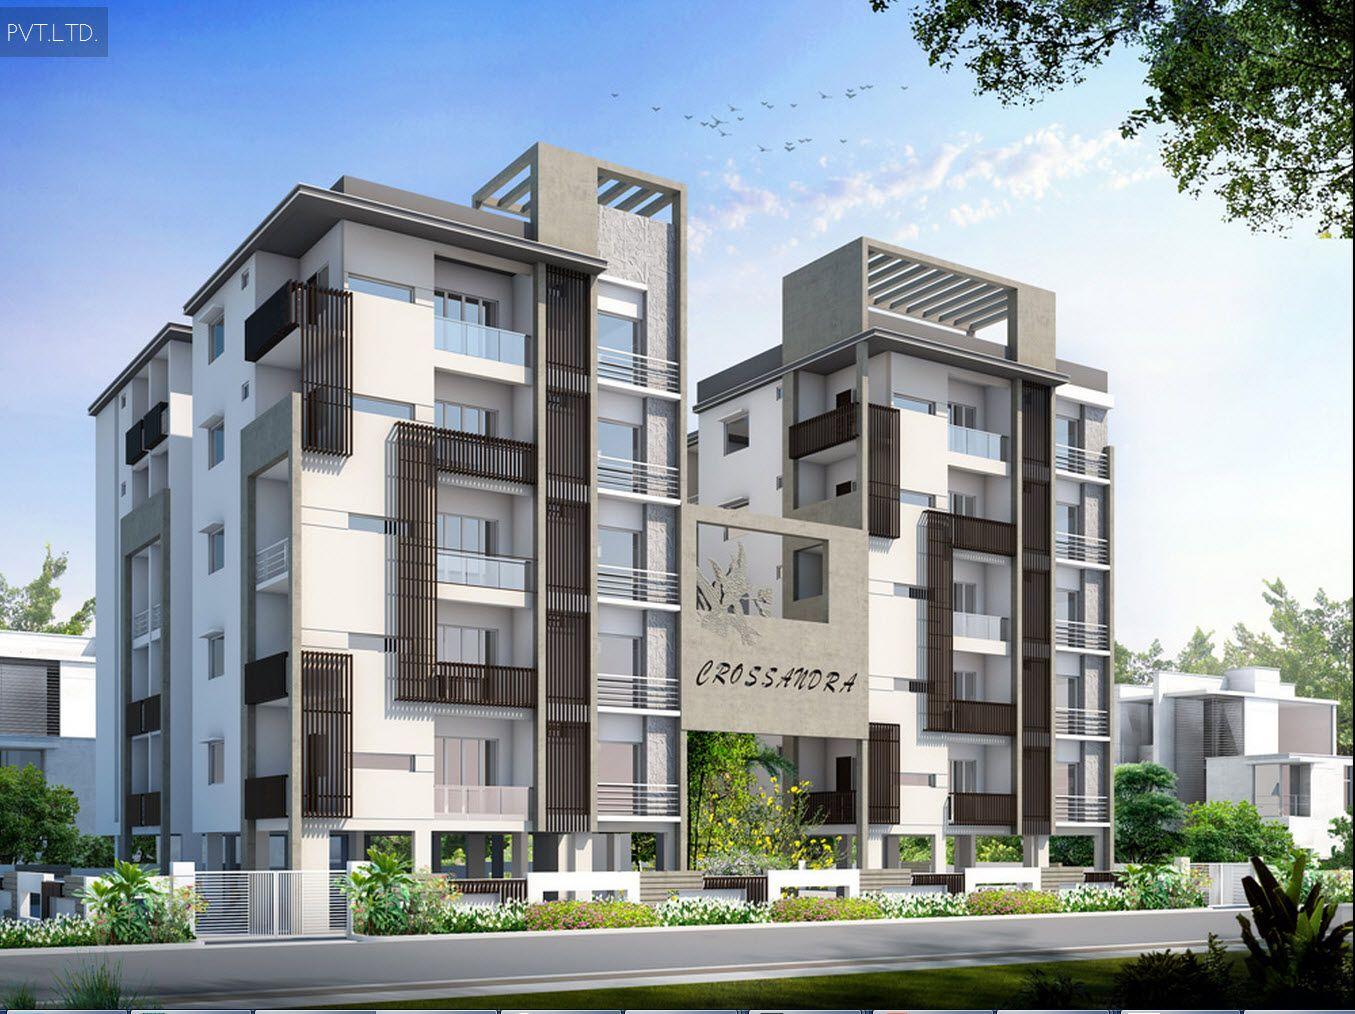 Avijit Das Adl Kullan C N N Apartment Panosundaki Pin Building Design Architecture Ve